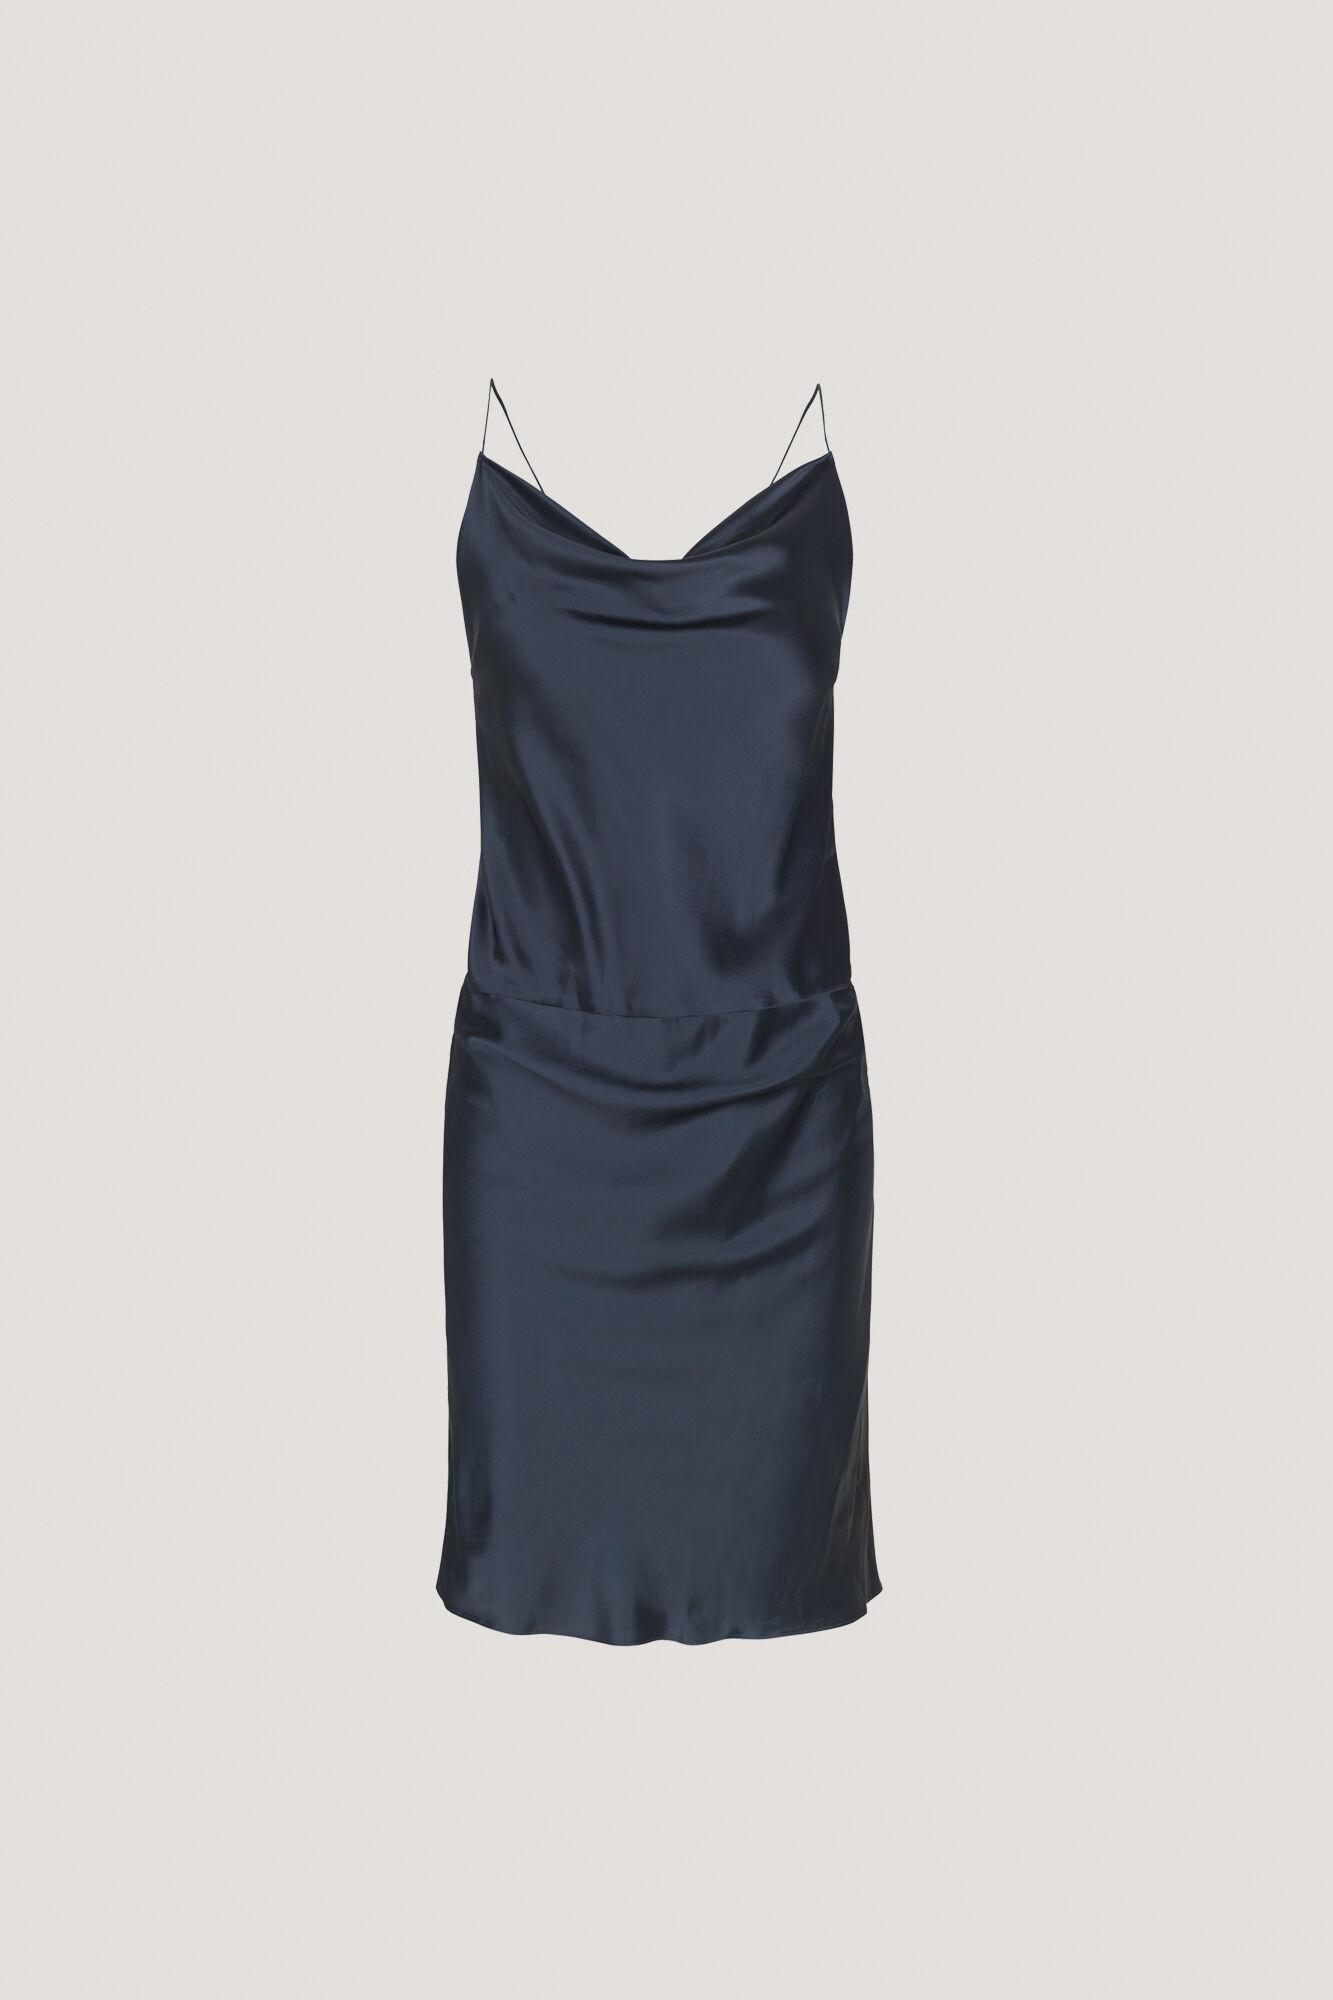 Apples s dress 9697